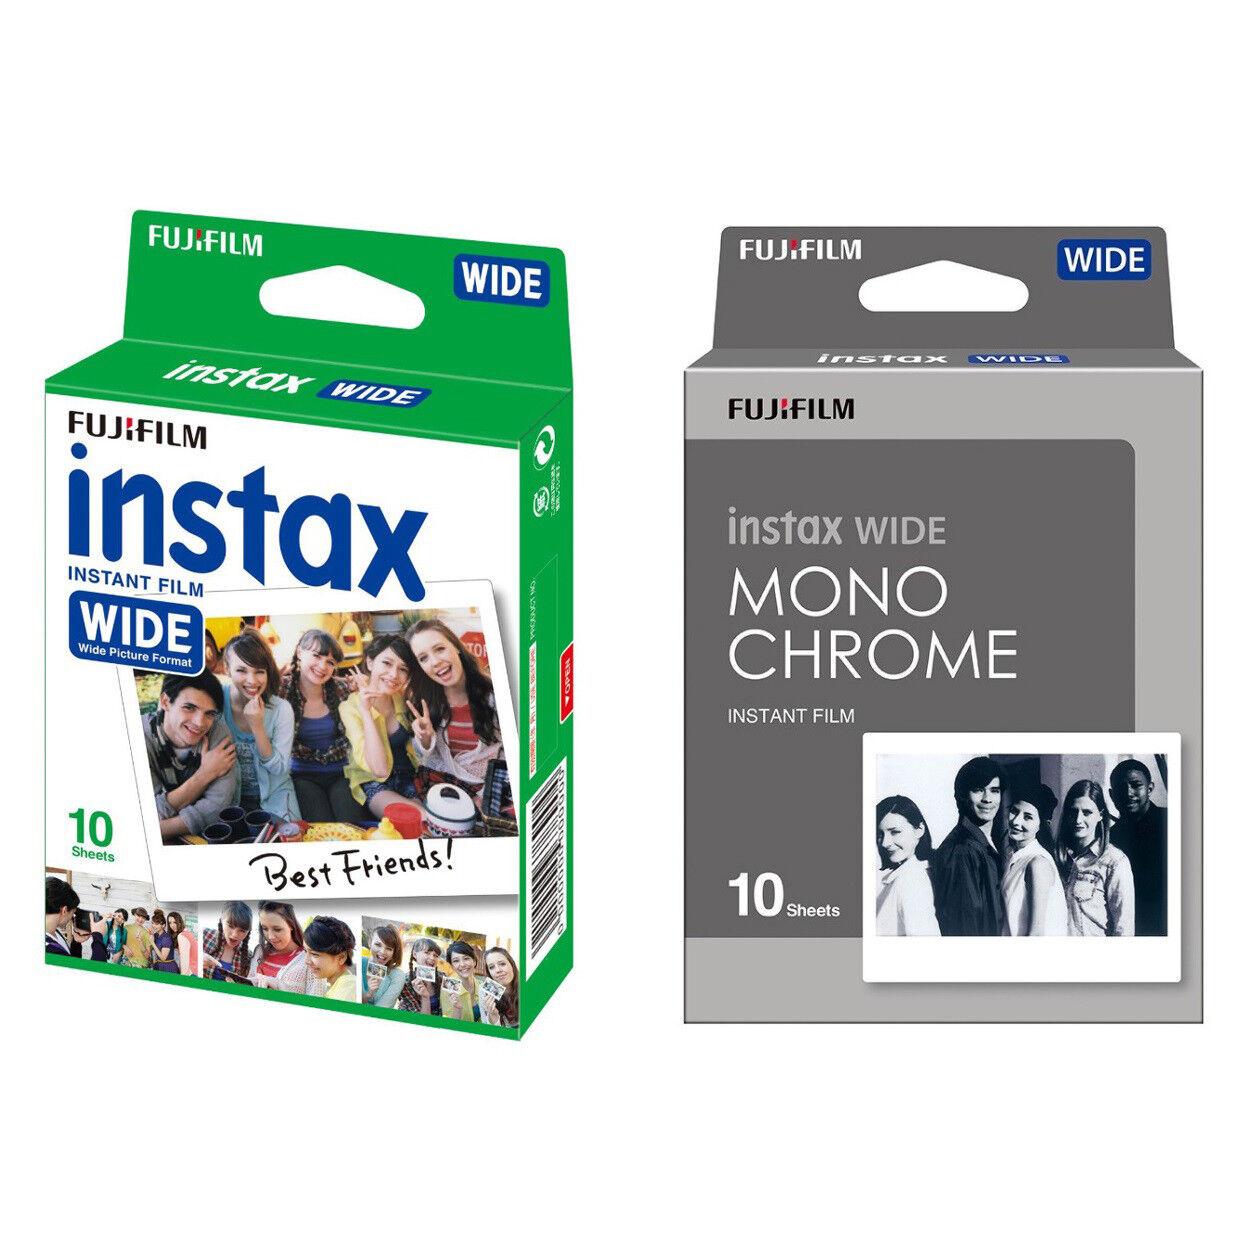 Plain & Monochrome FujiFilm Instax Wide Film Polaroid 20 Ins